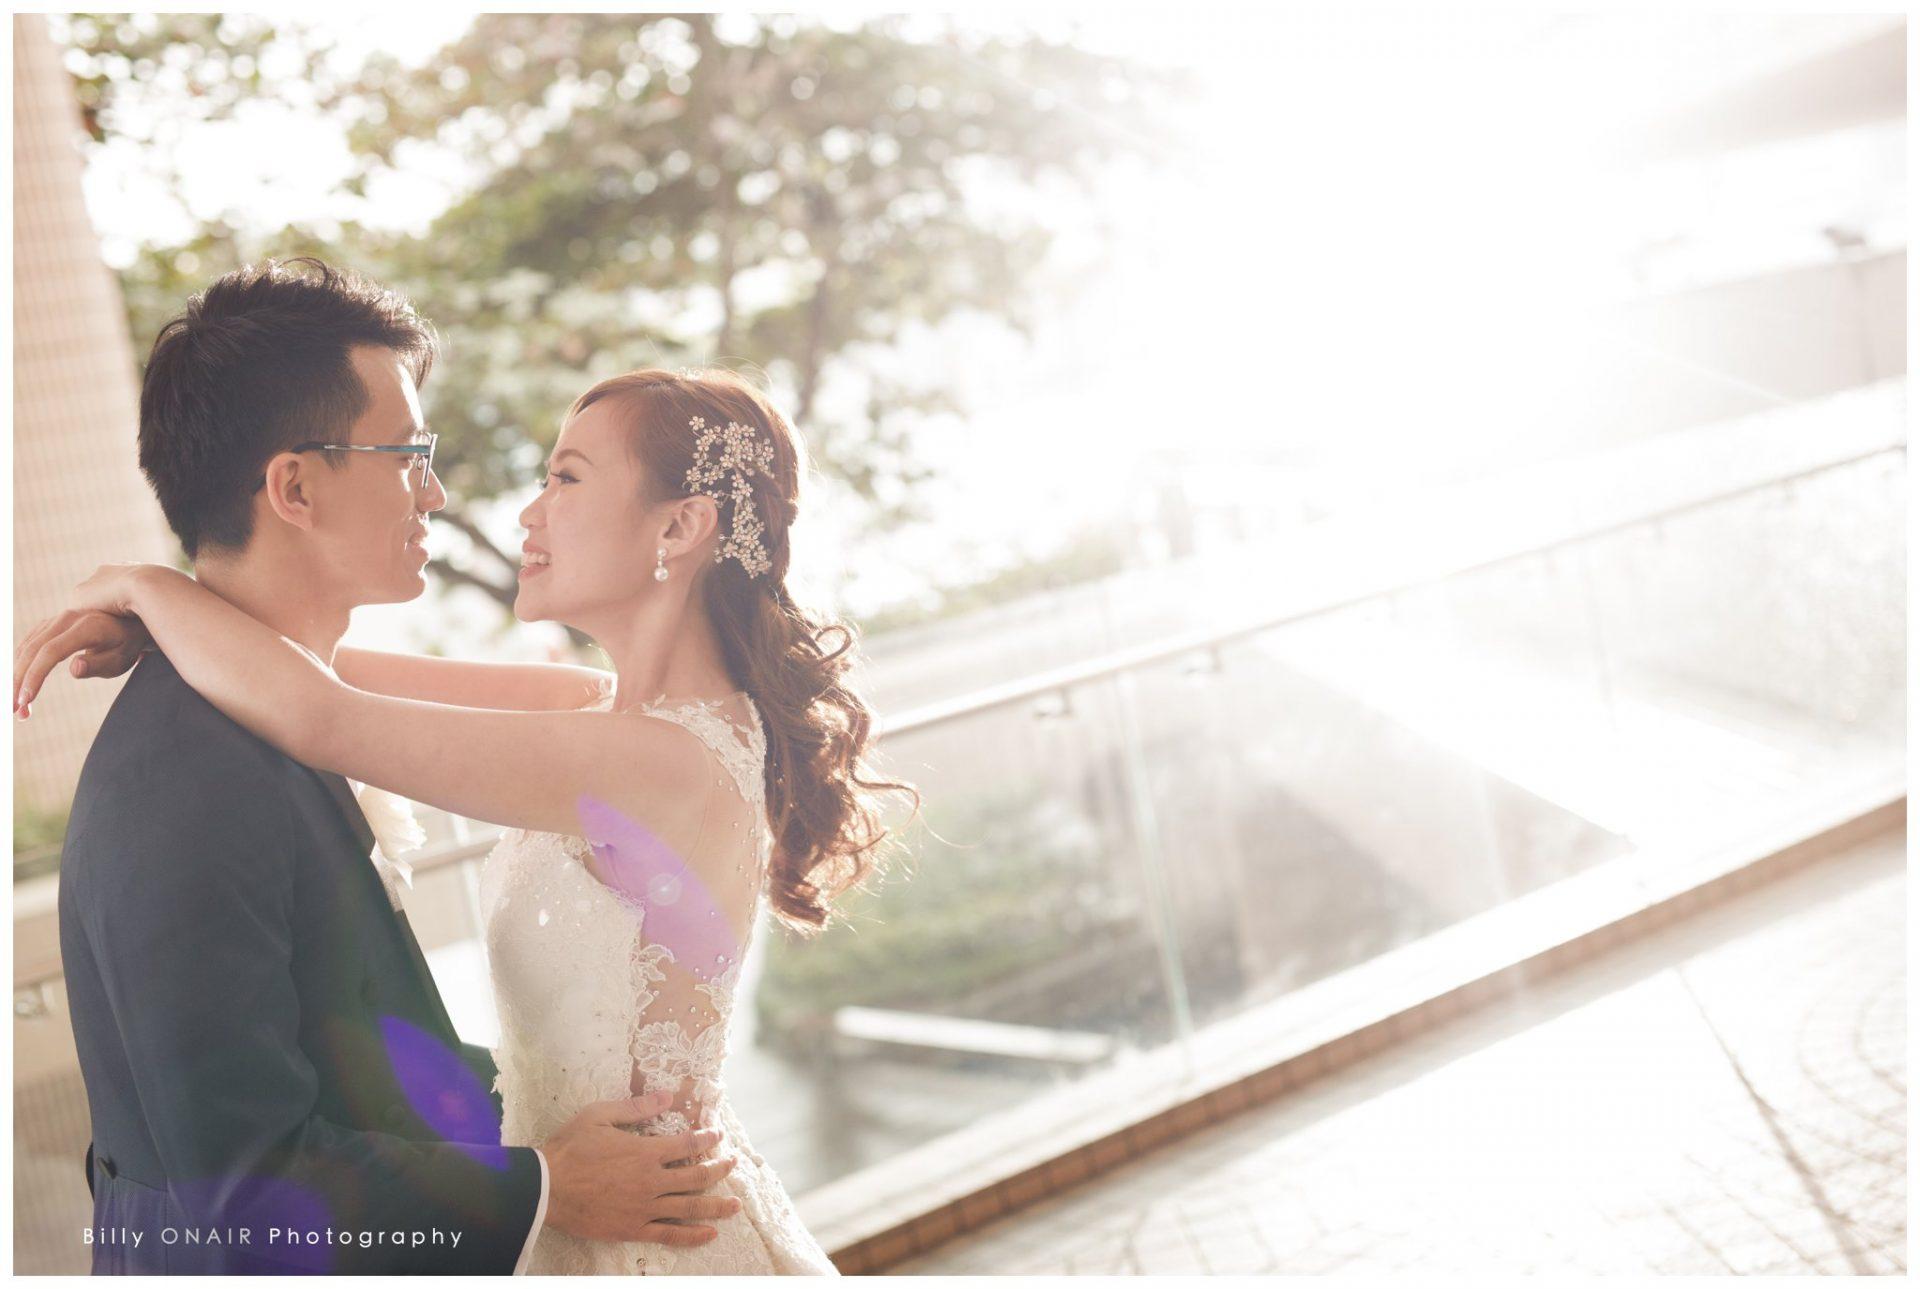 billy_wedding_photography_022